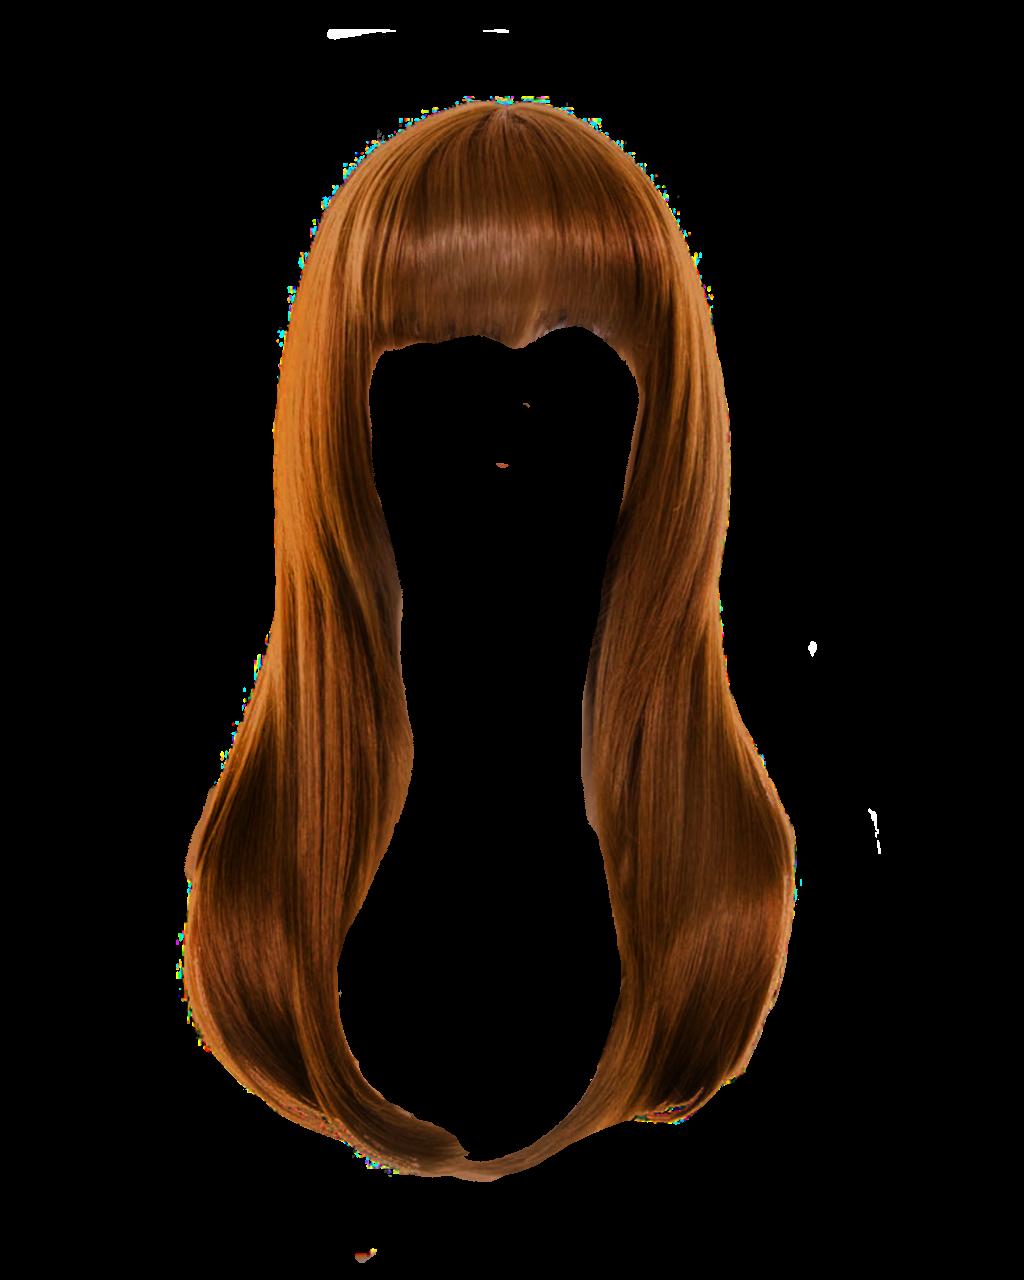 Brown Women Hair PNG File